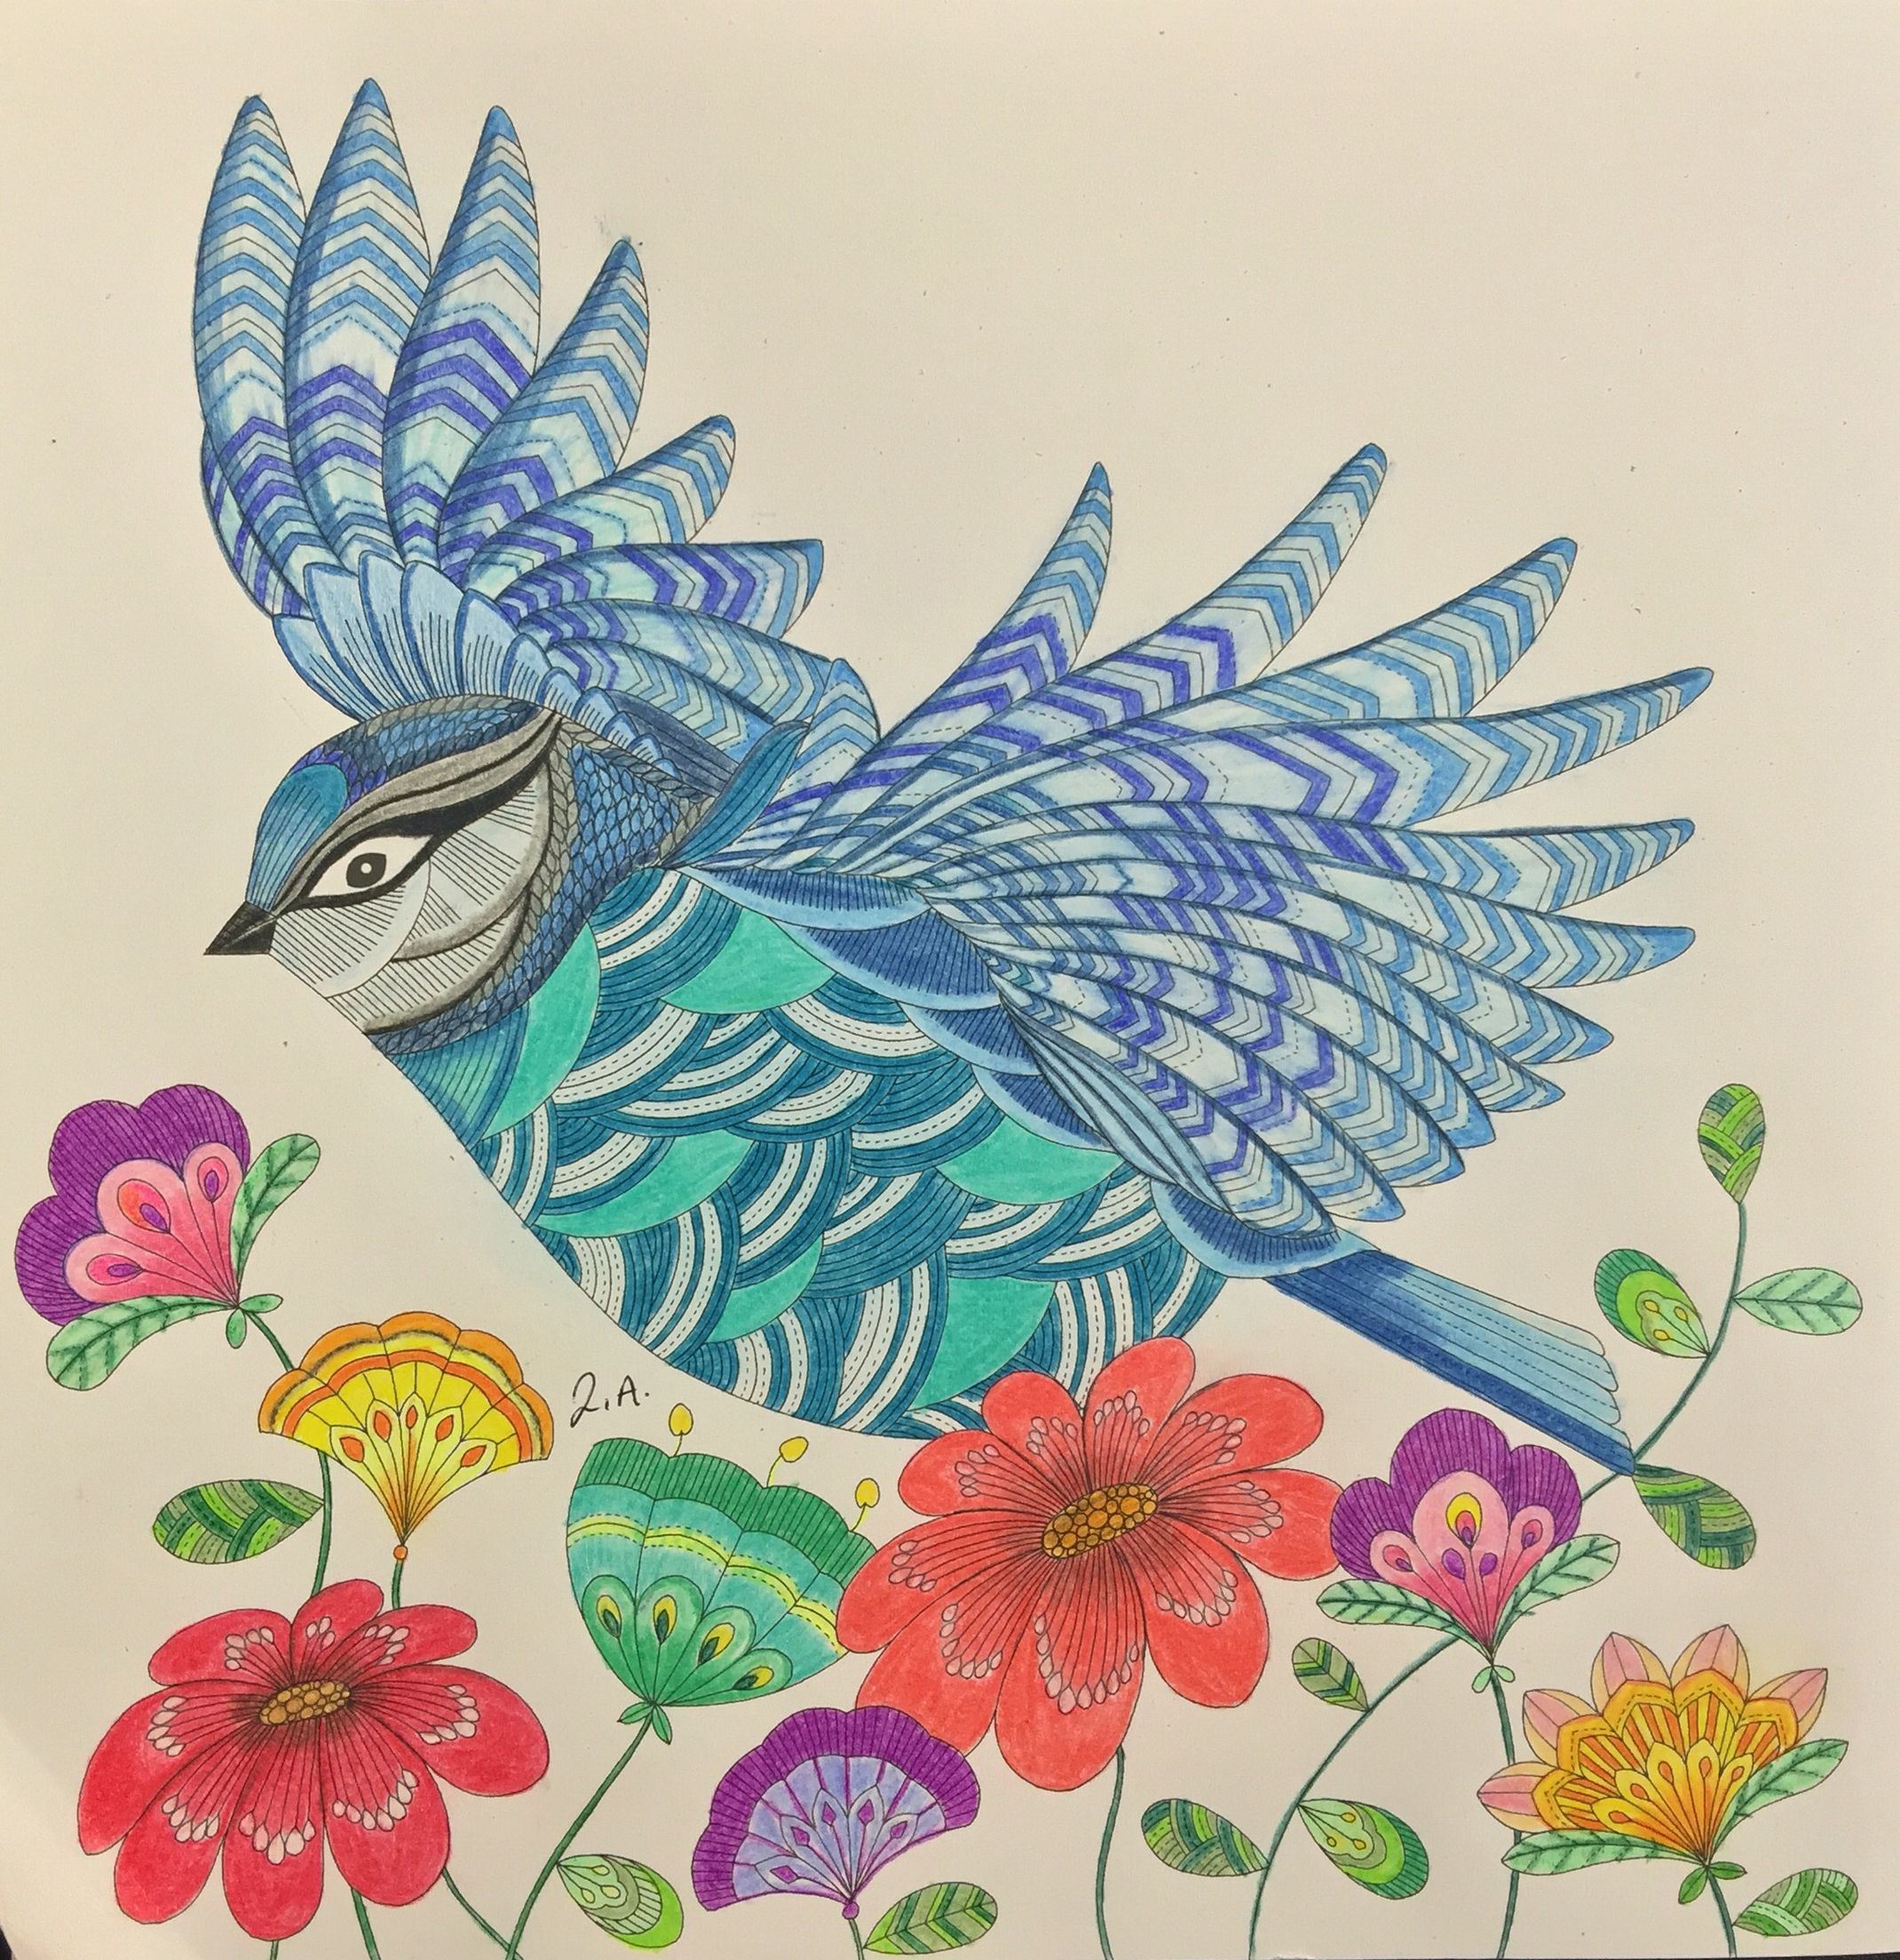 Color me draw me animal kingdom book - Bird Flowers Animal Kingdom Millie Marotta Birds Color Me Draw Me